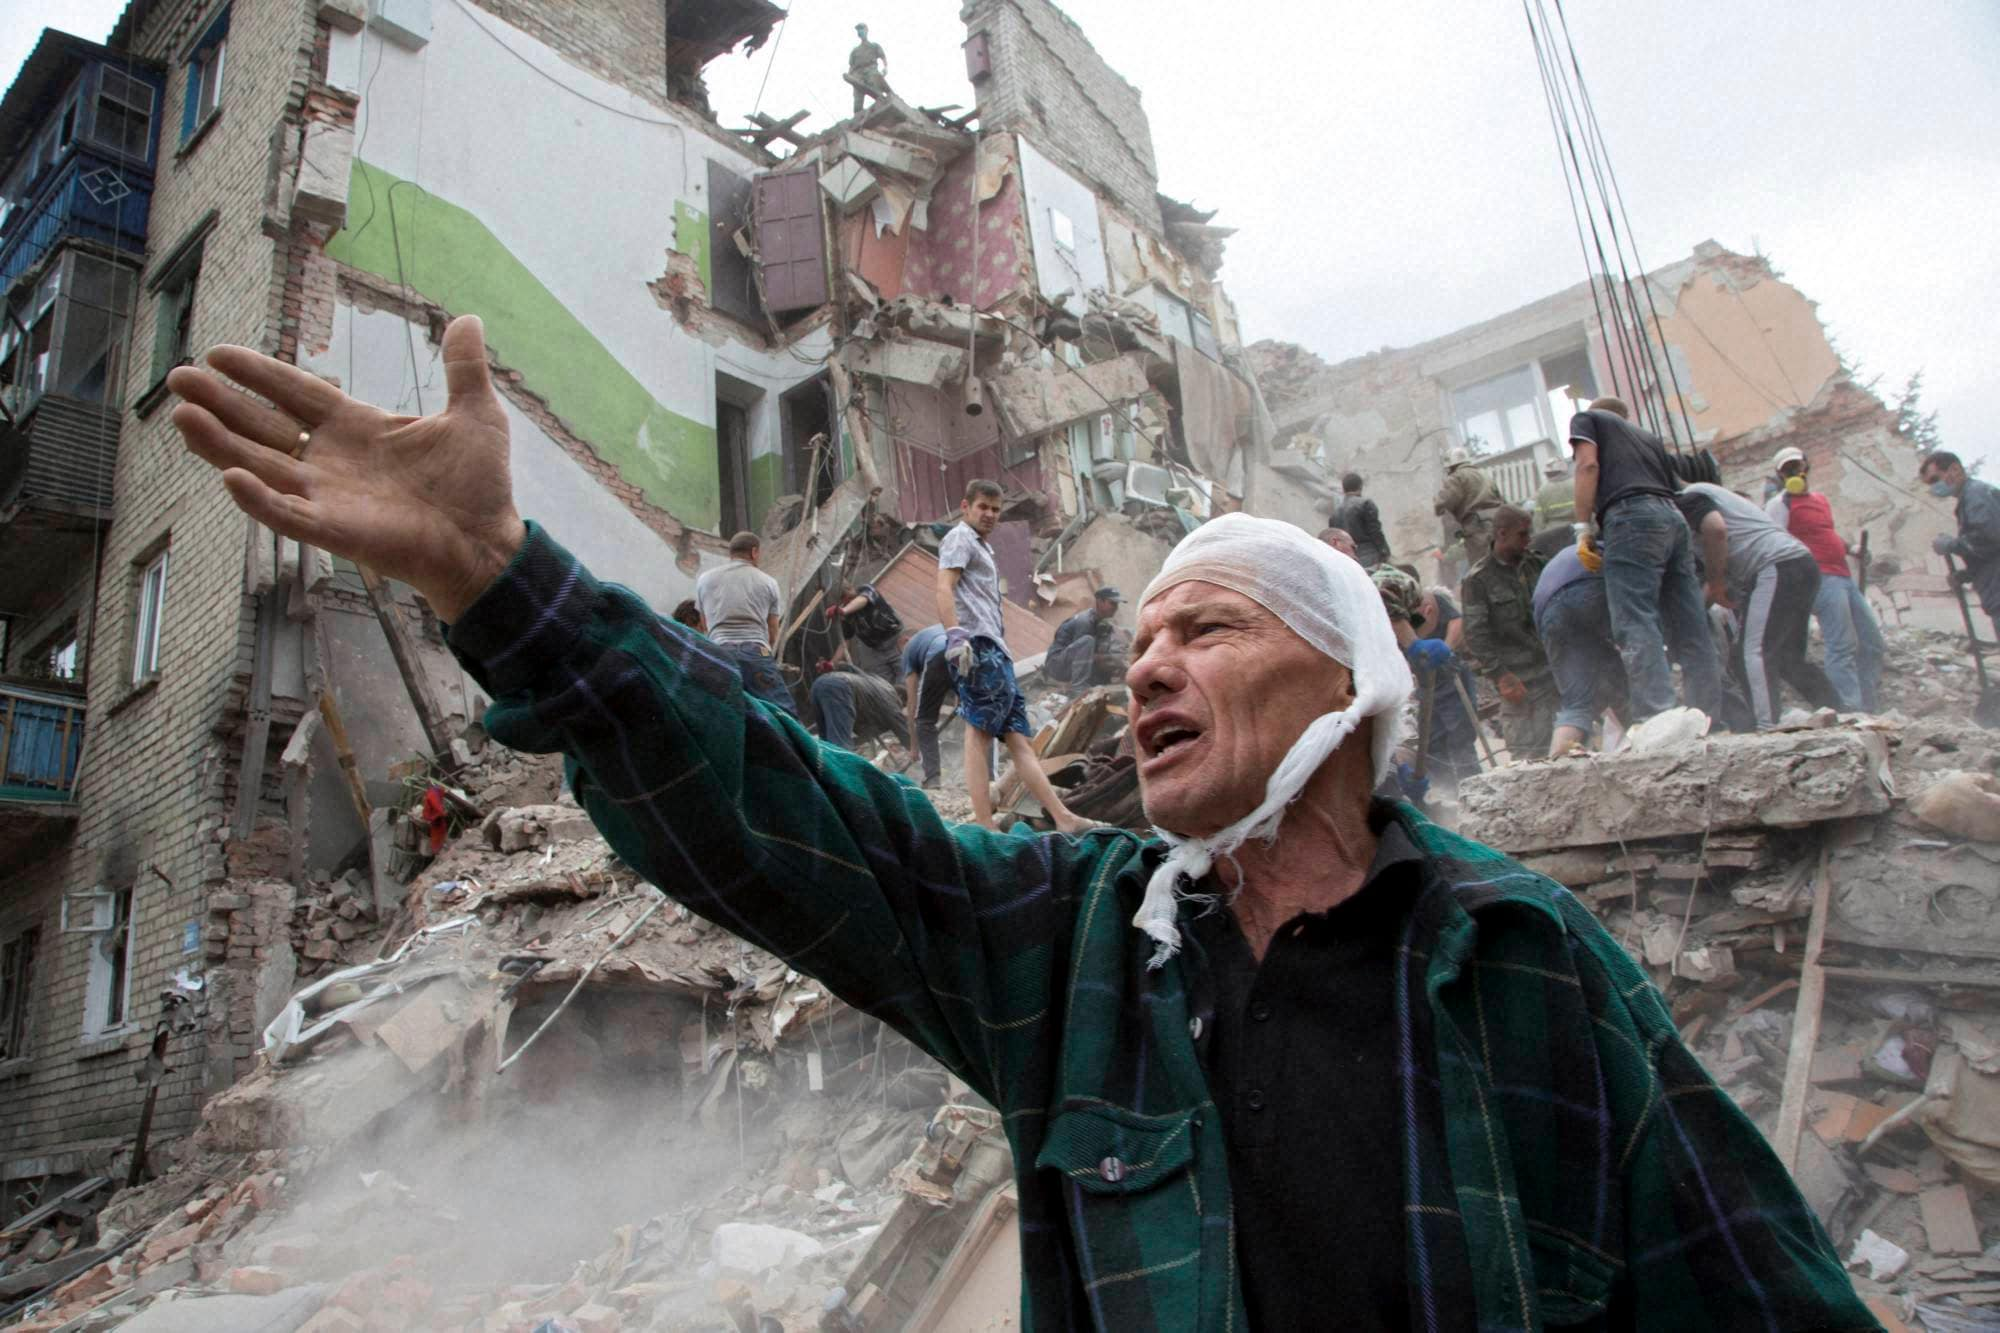 Smoke, rises, Israeli missile, strike, Gaza, military, airstrikes, Gaza, Hamas militants, violated, de-escalation, brokered, Egypt